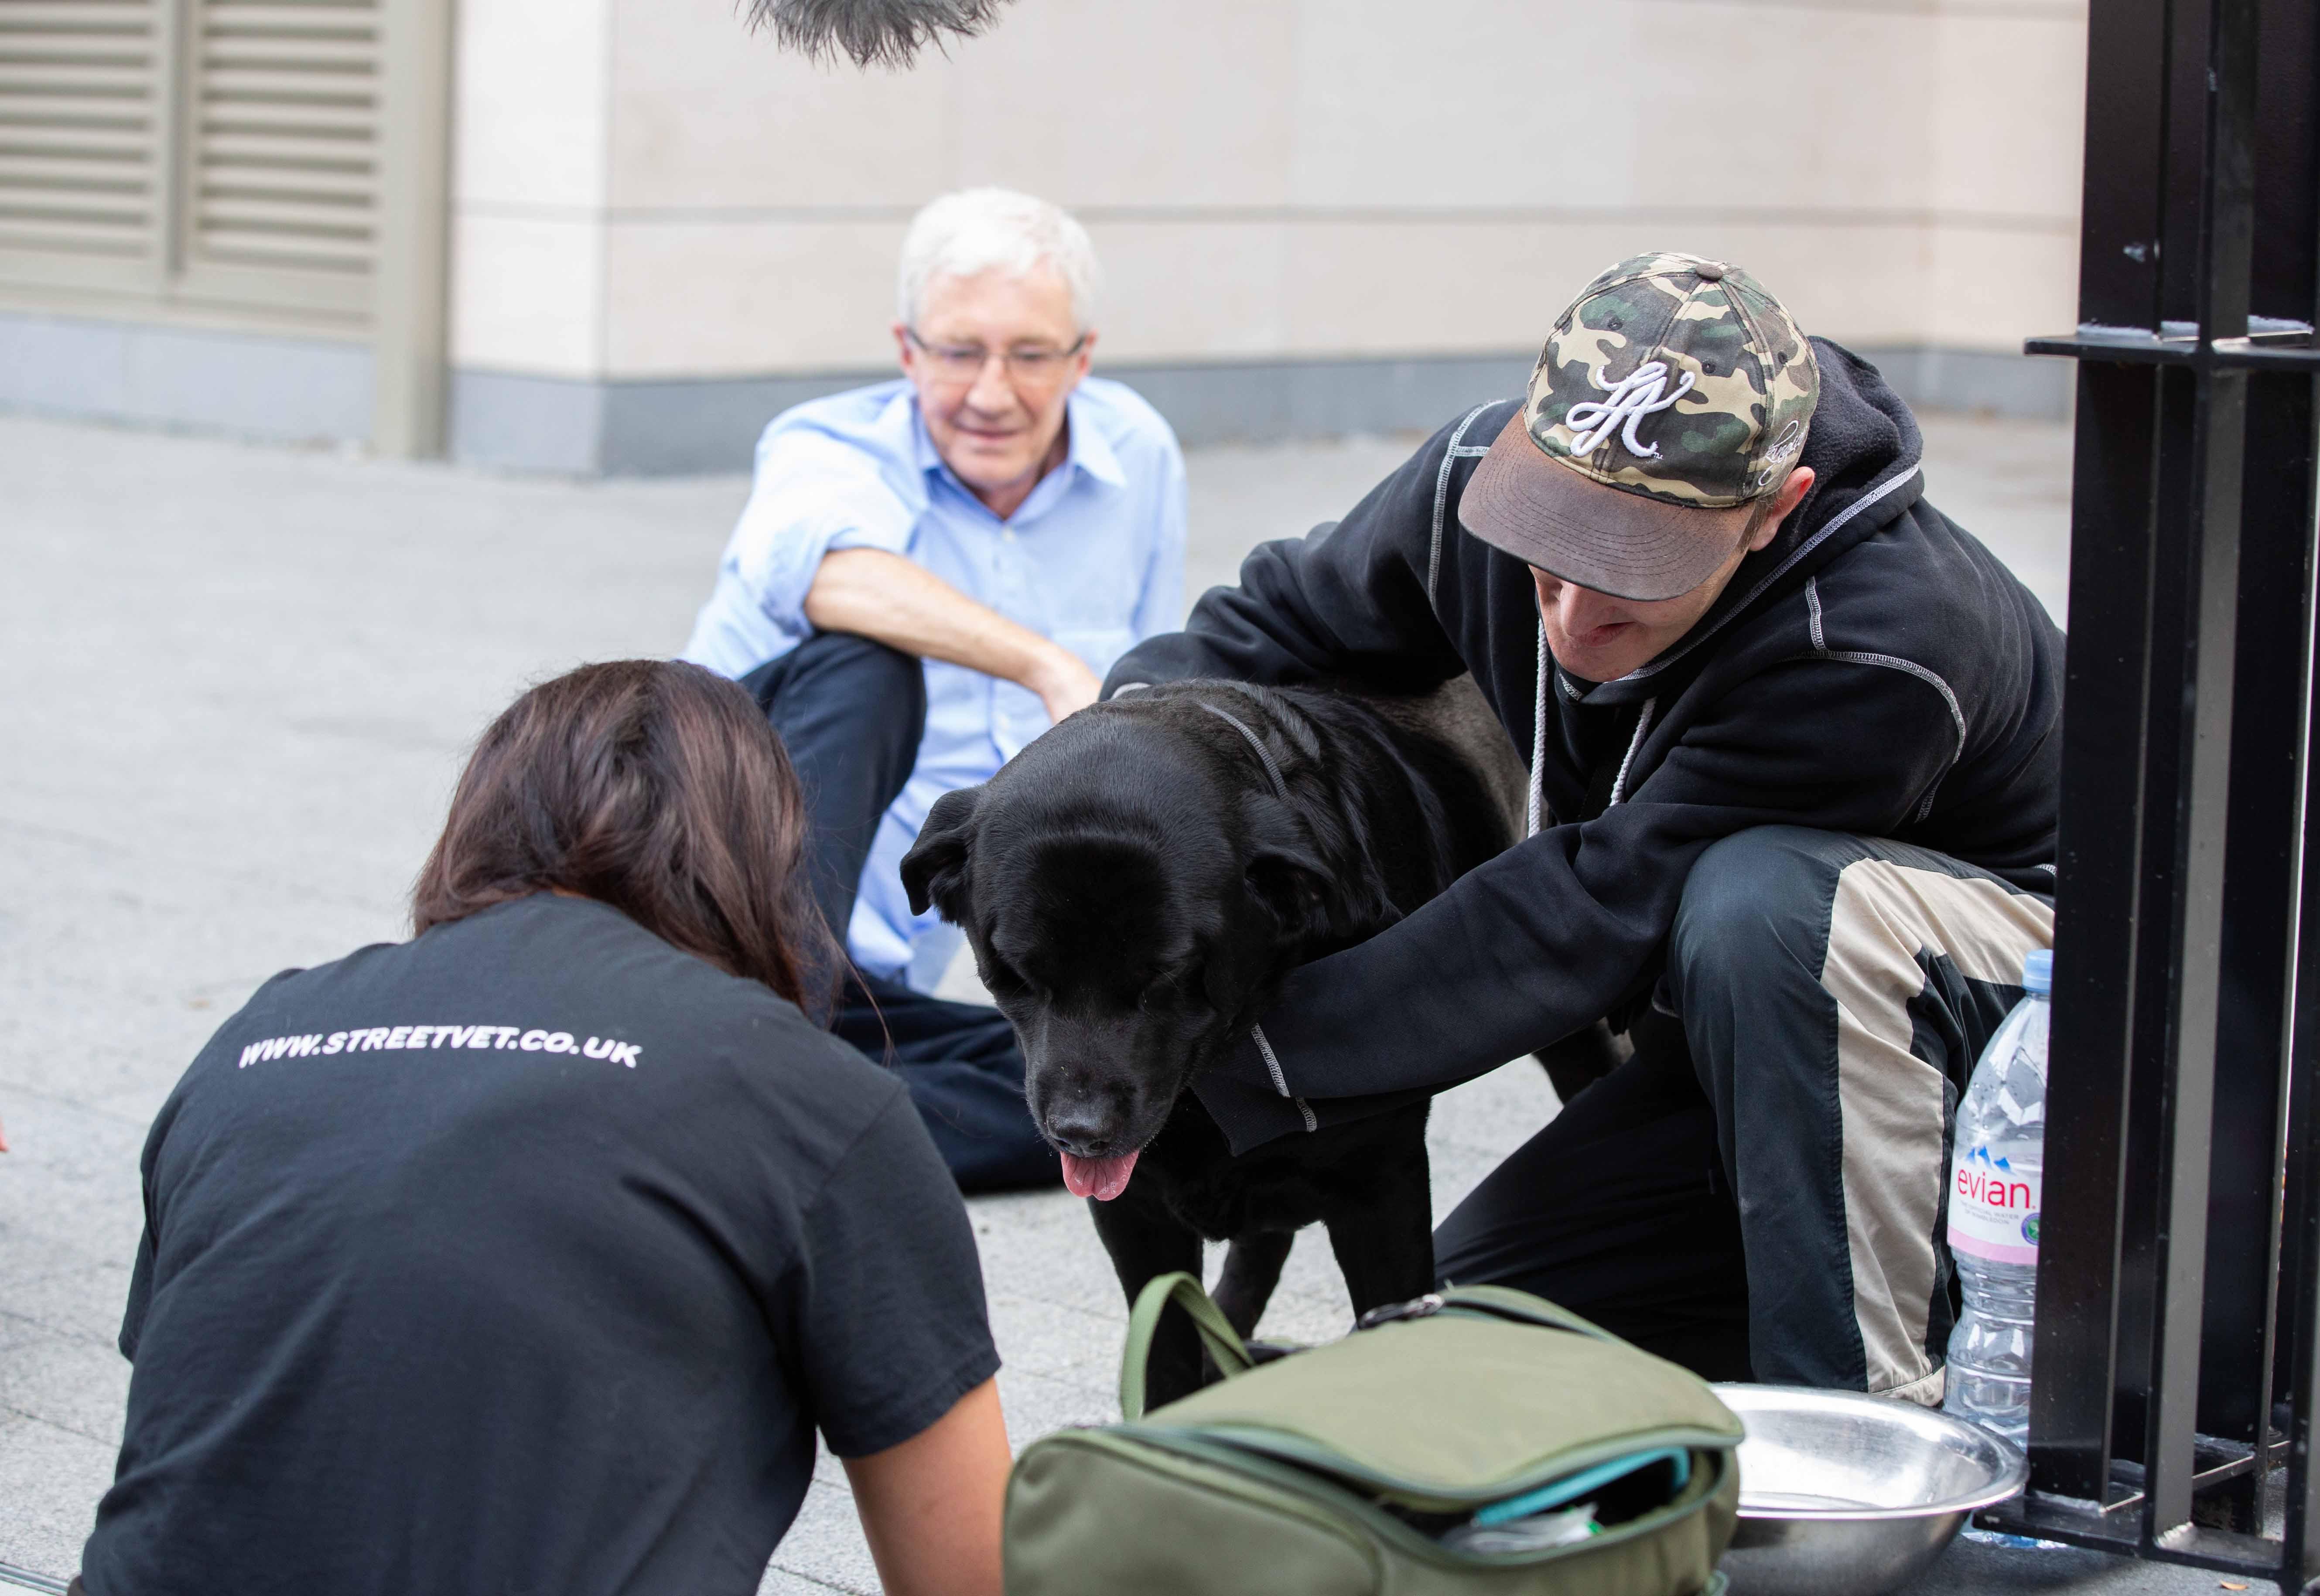 Paul O'Grady and StreetVet treating dogs on the street